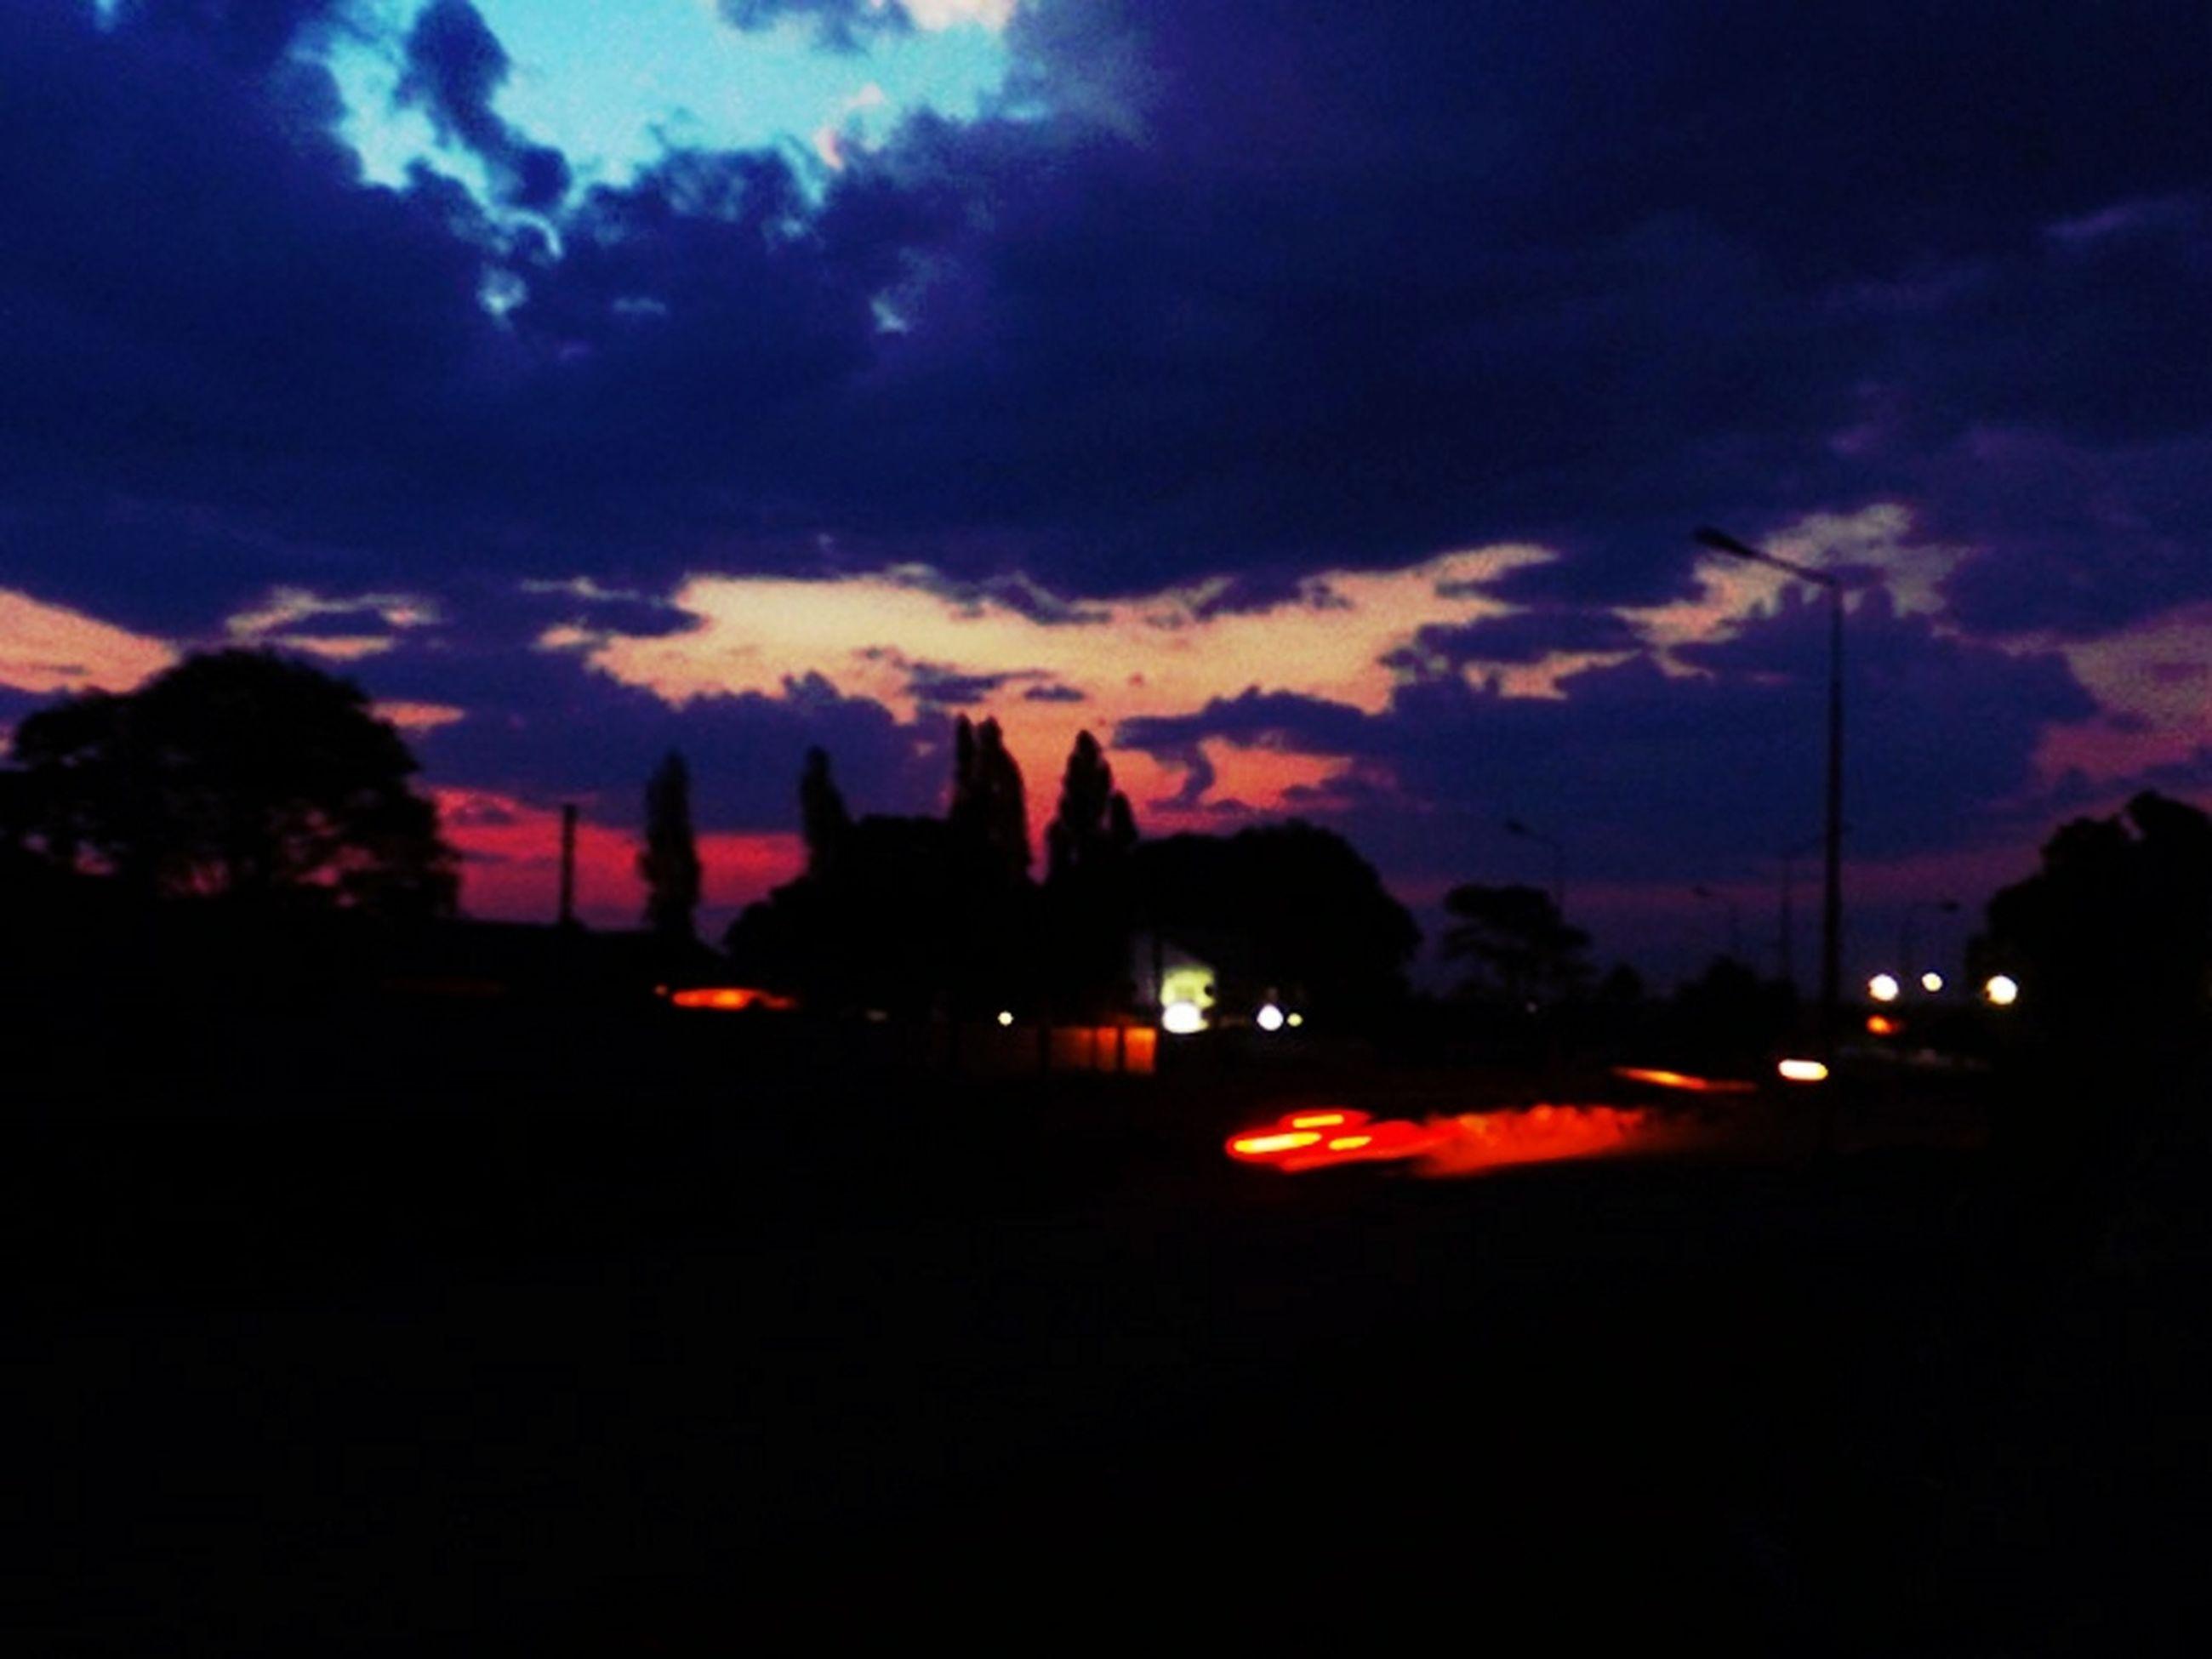 illuminated, sky, sunset, silhouette, building exterior, cloud - sky, city, street light, night, dusk, built structure, architecture, dark, tree, car, street, dramatic sky, cloud, transportation, road